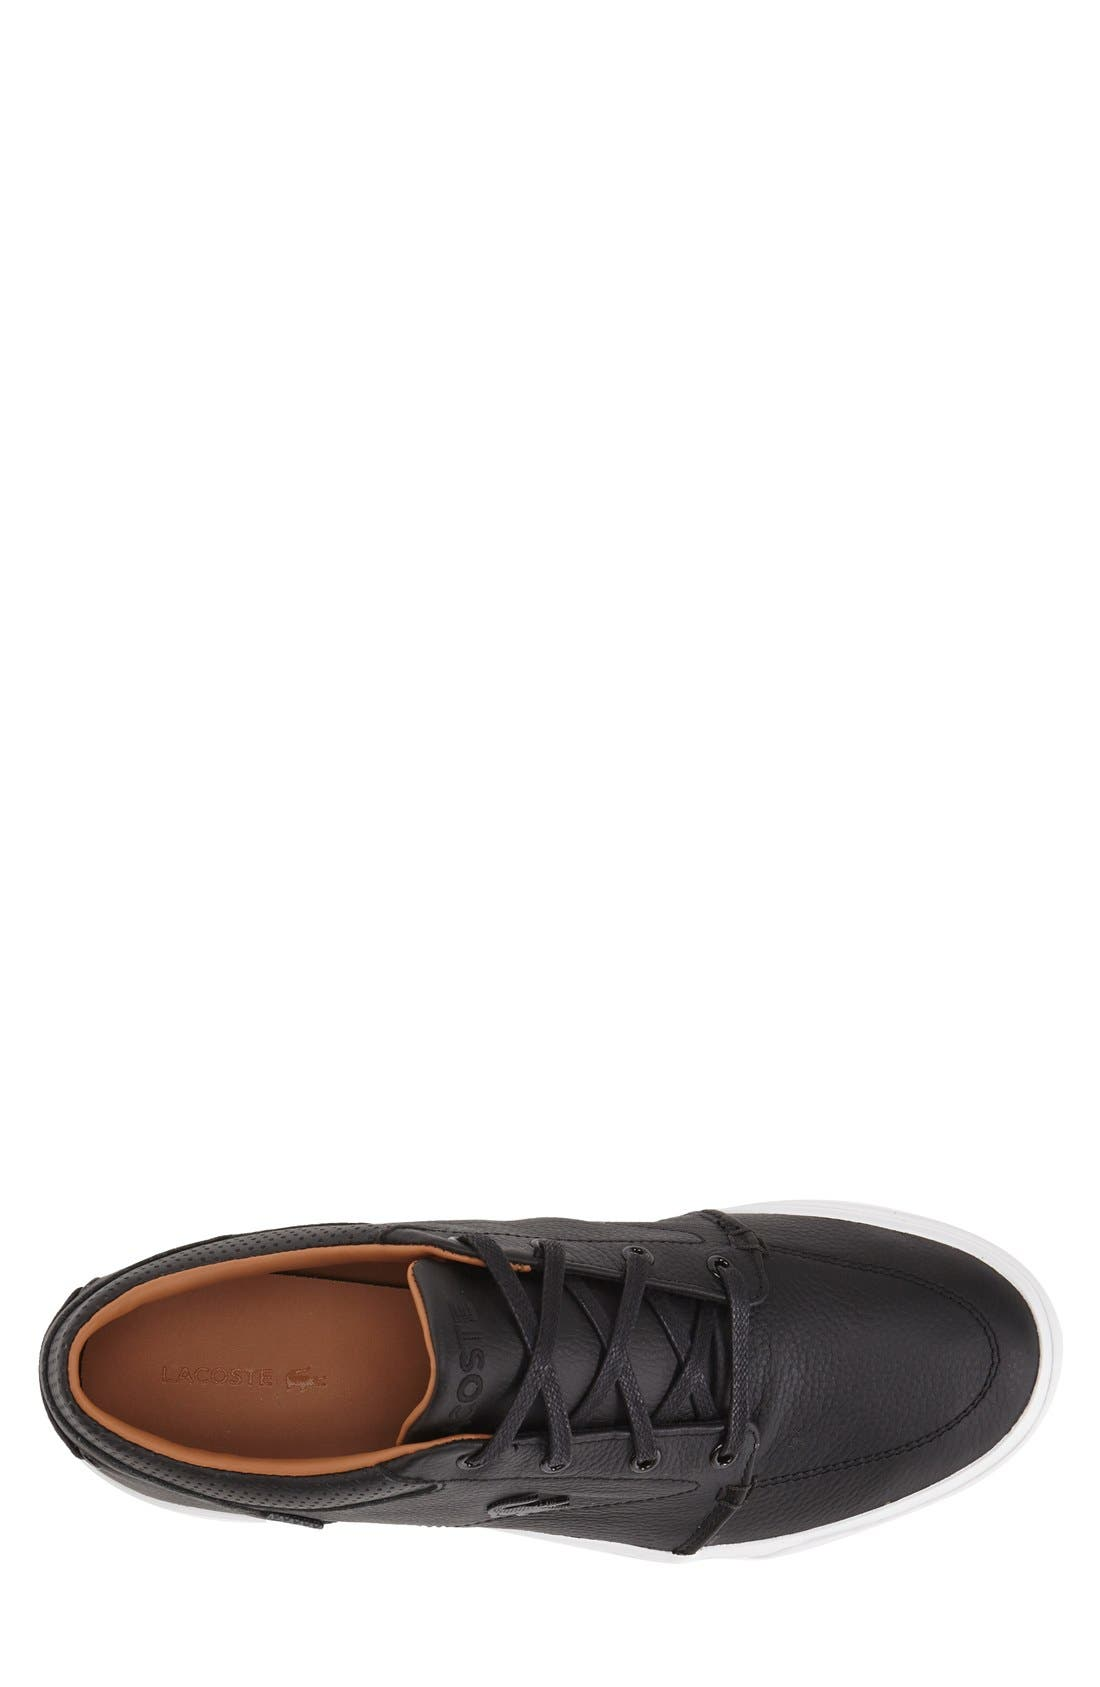 LACOSTE,                             'Bayliss' Sneaker,                             Alternate thumbnail 3, color,                             009